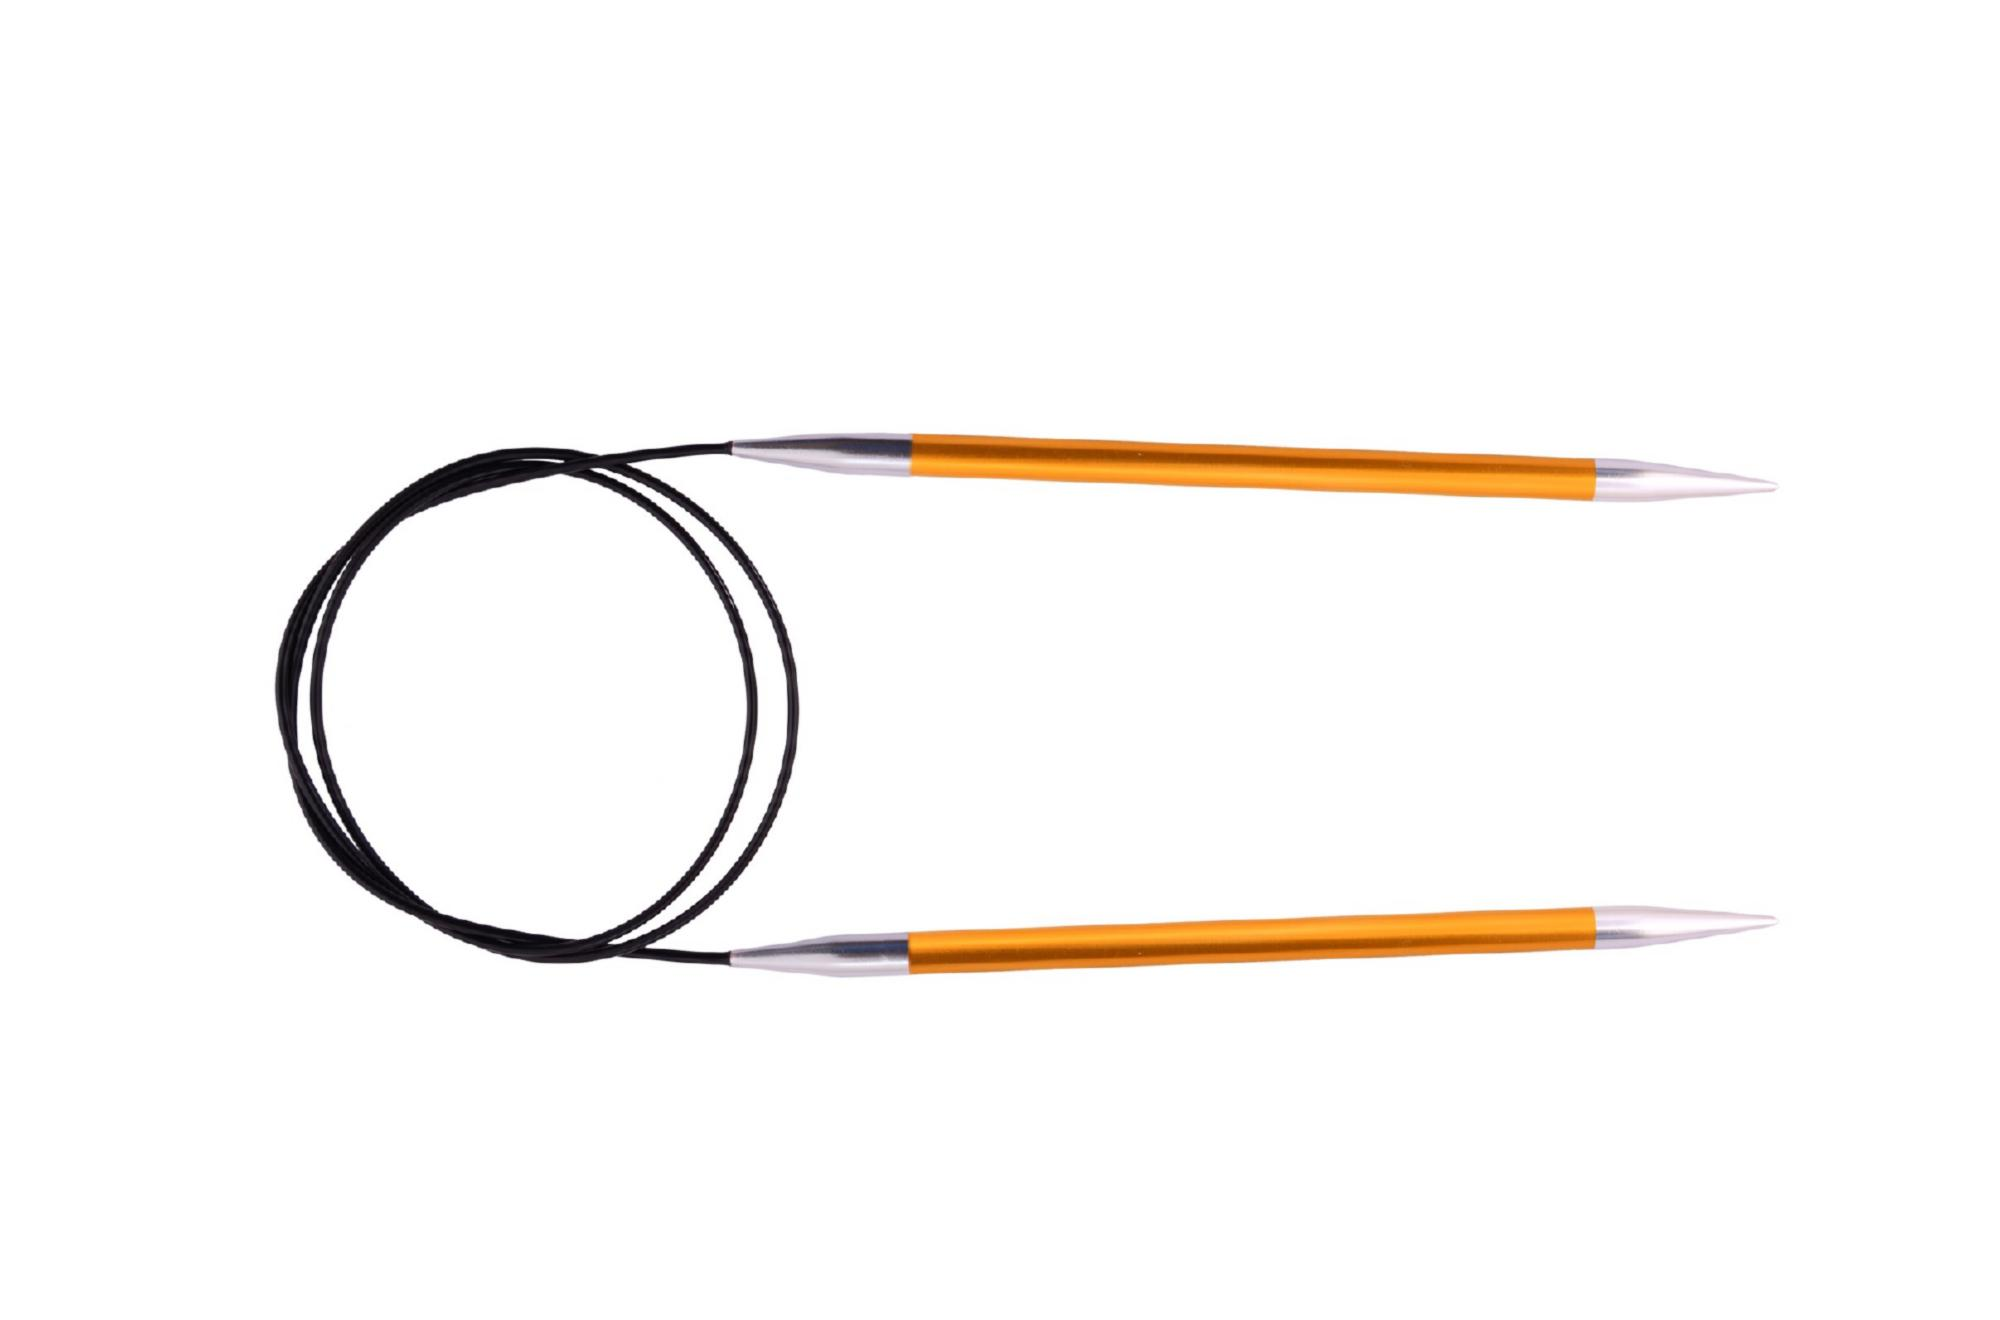 Спицы круговые 100 см Zing KnitPro, 47152, 2.25 мм